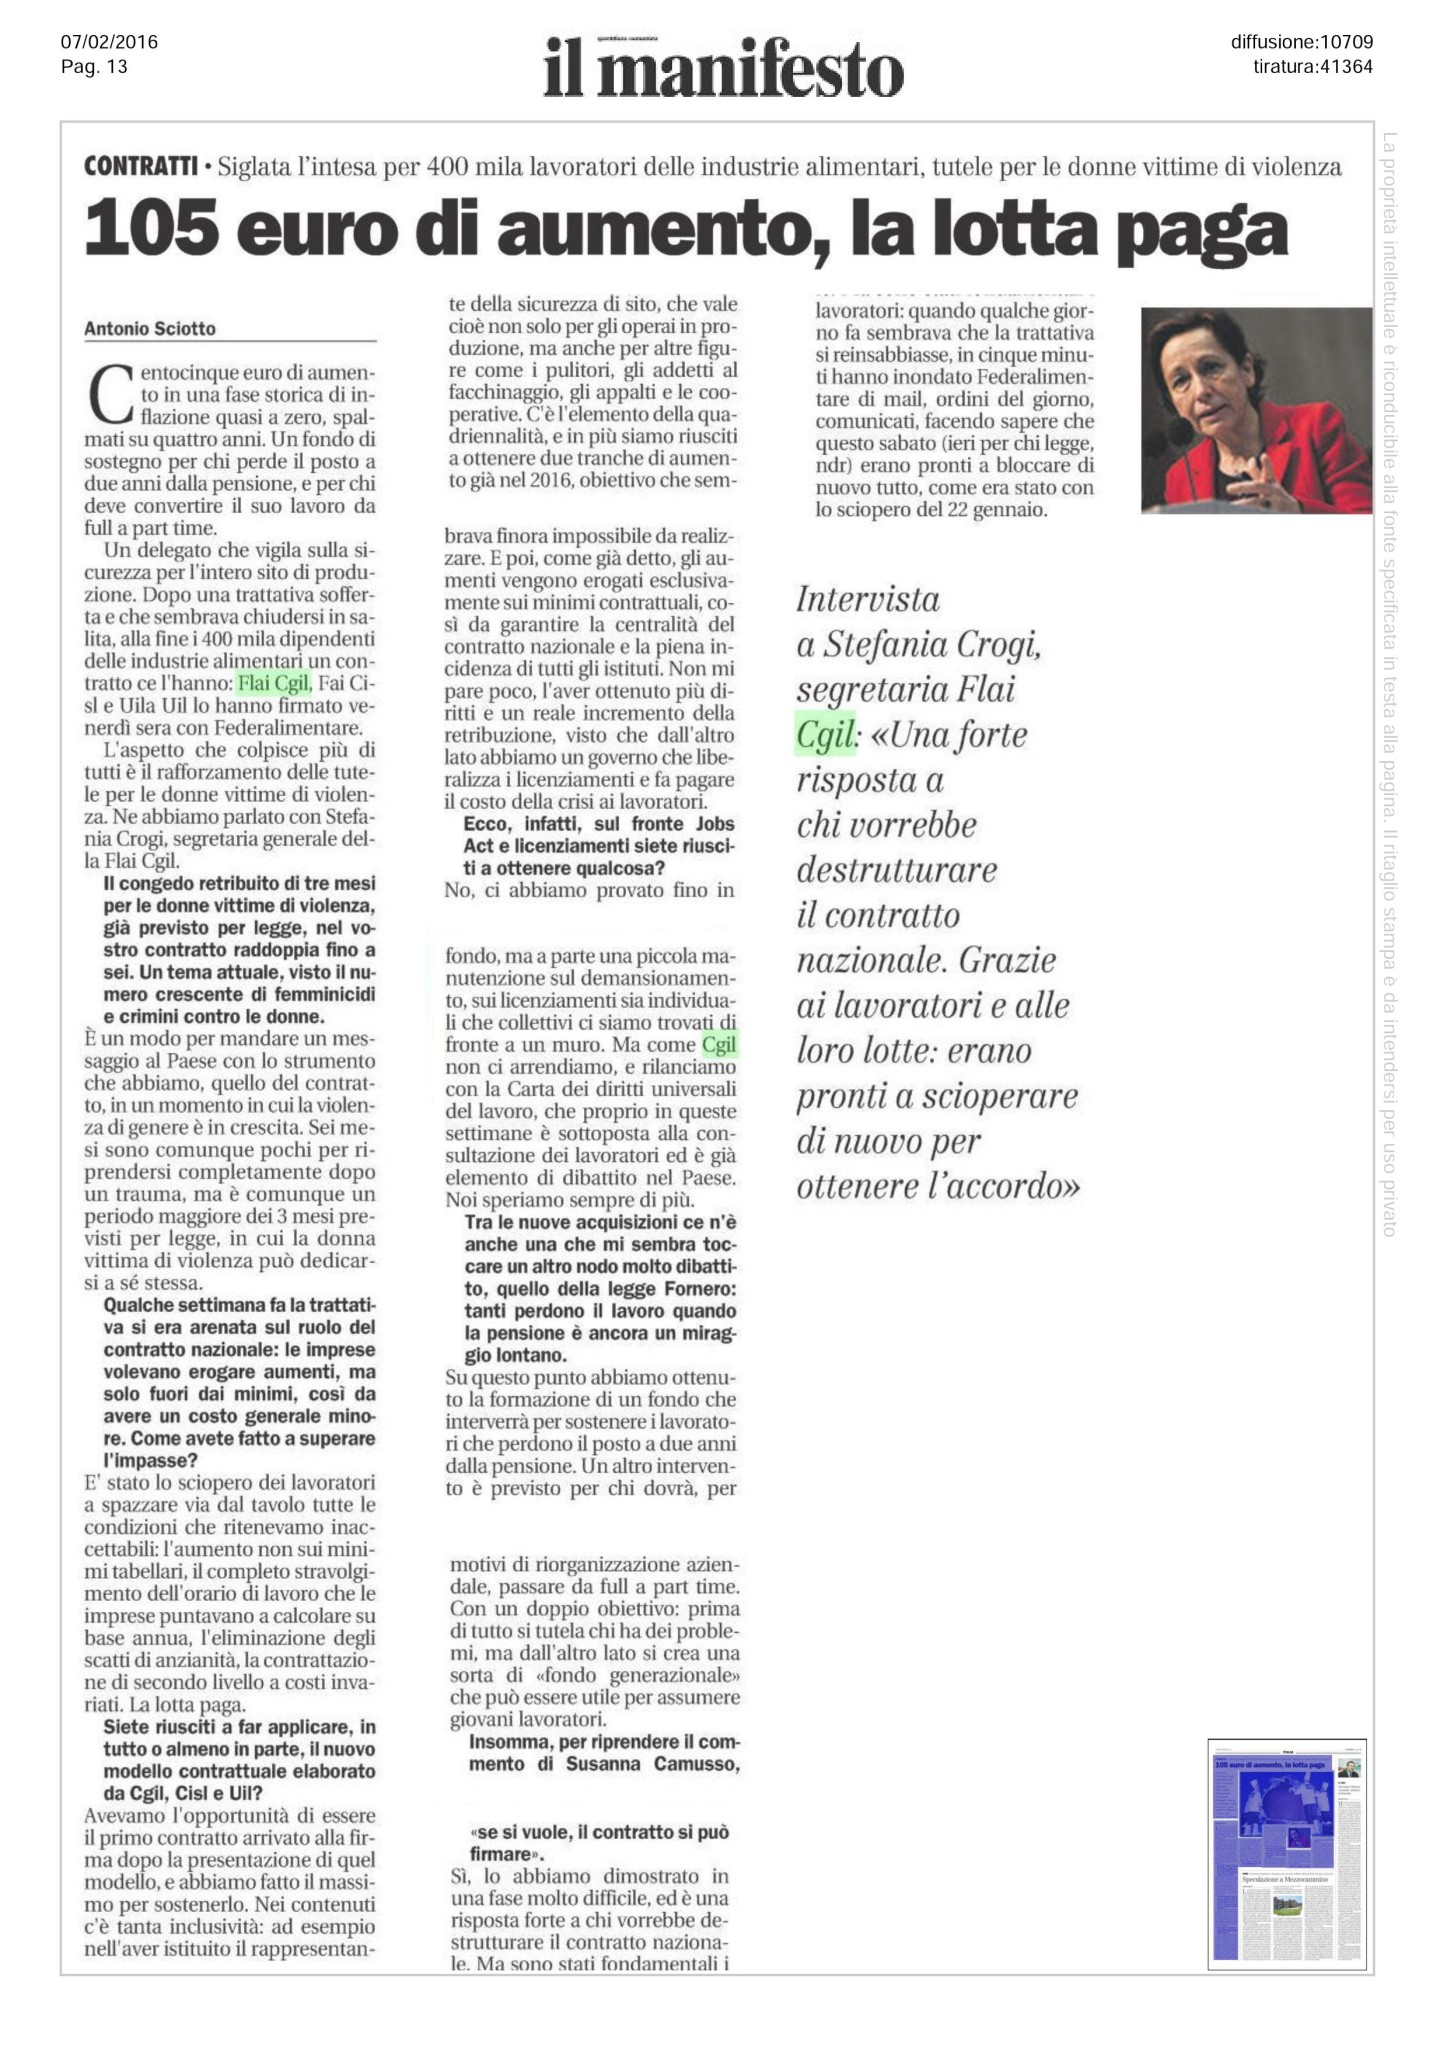 Intervista Stefania Crogi